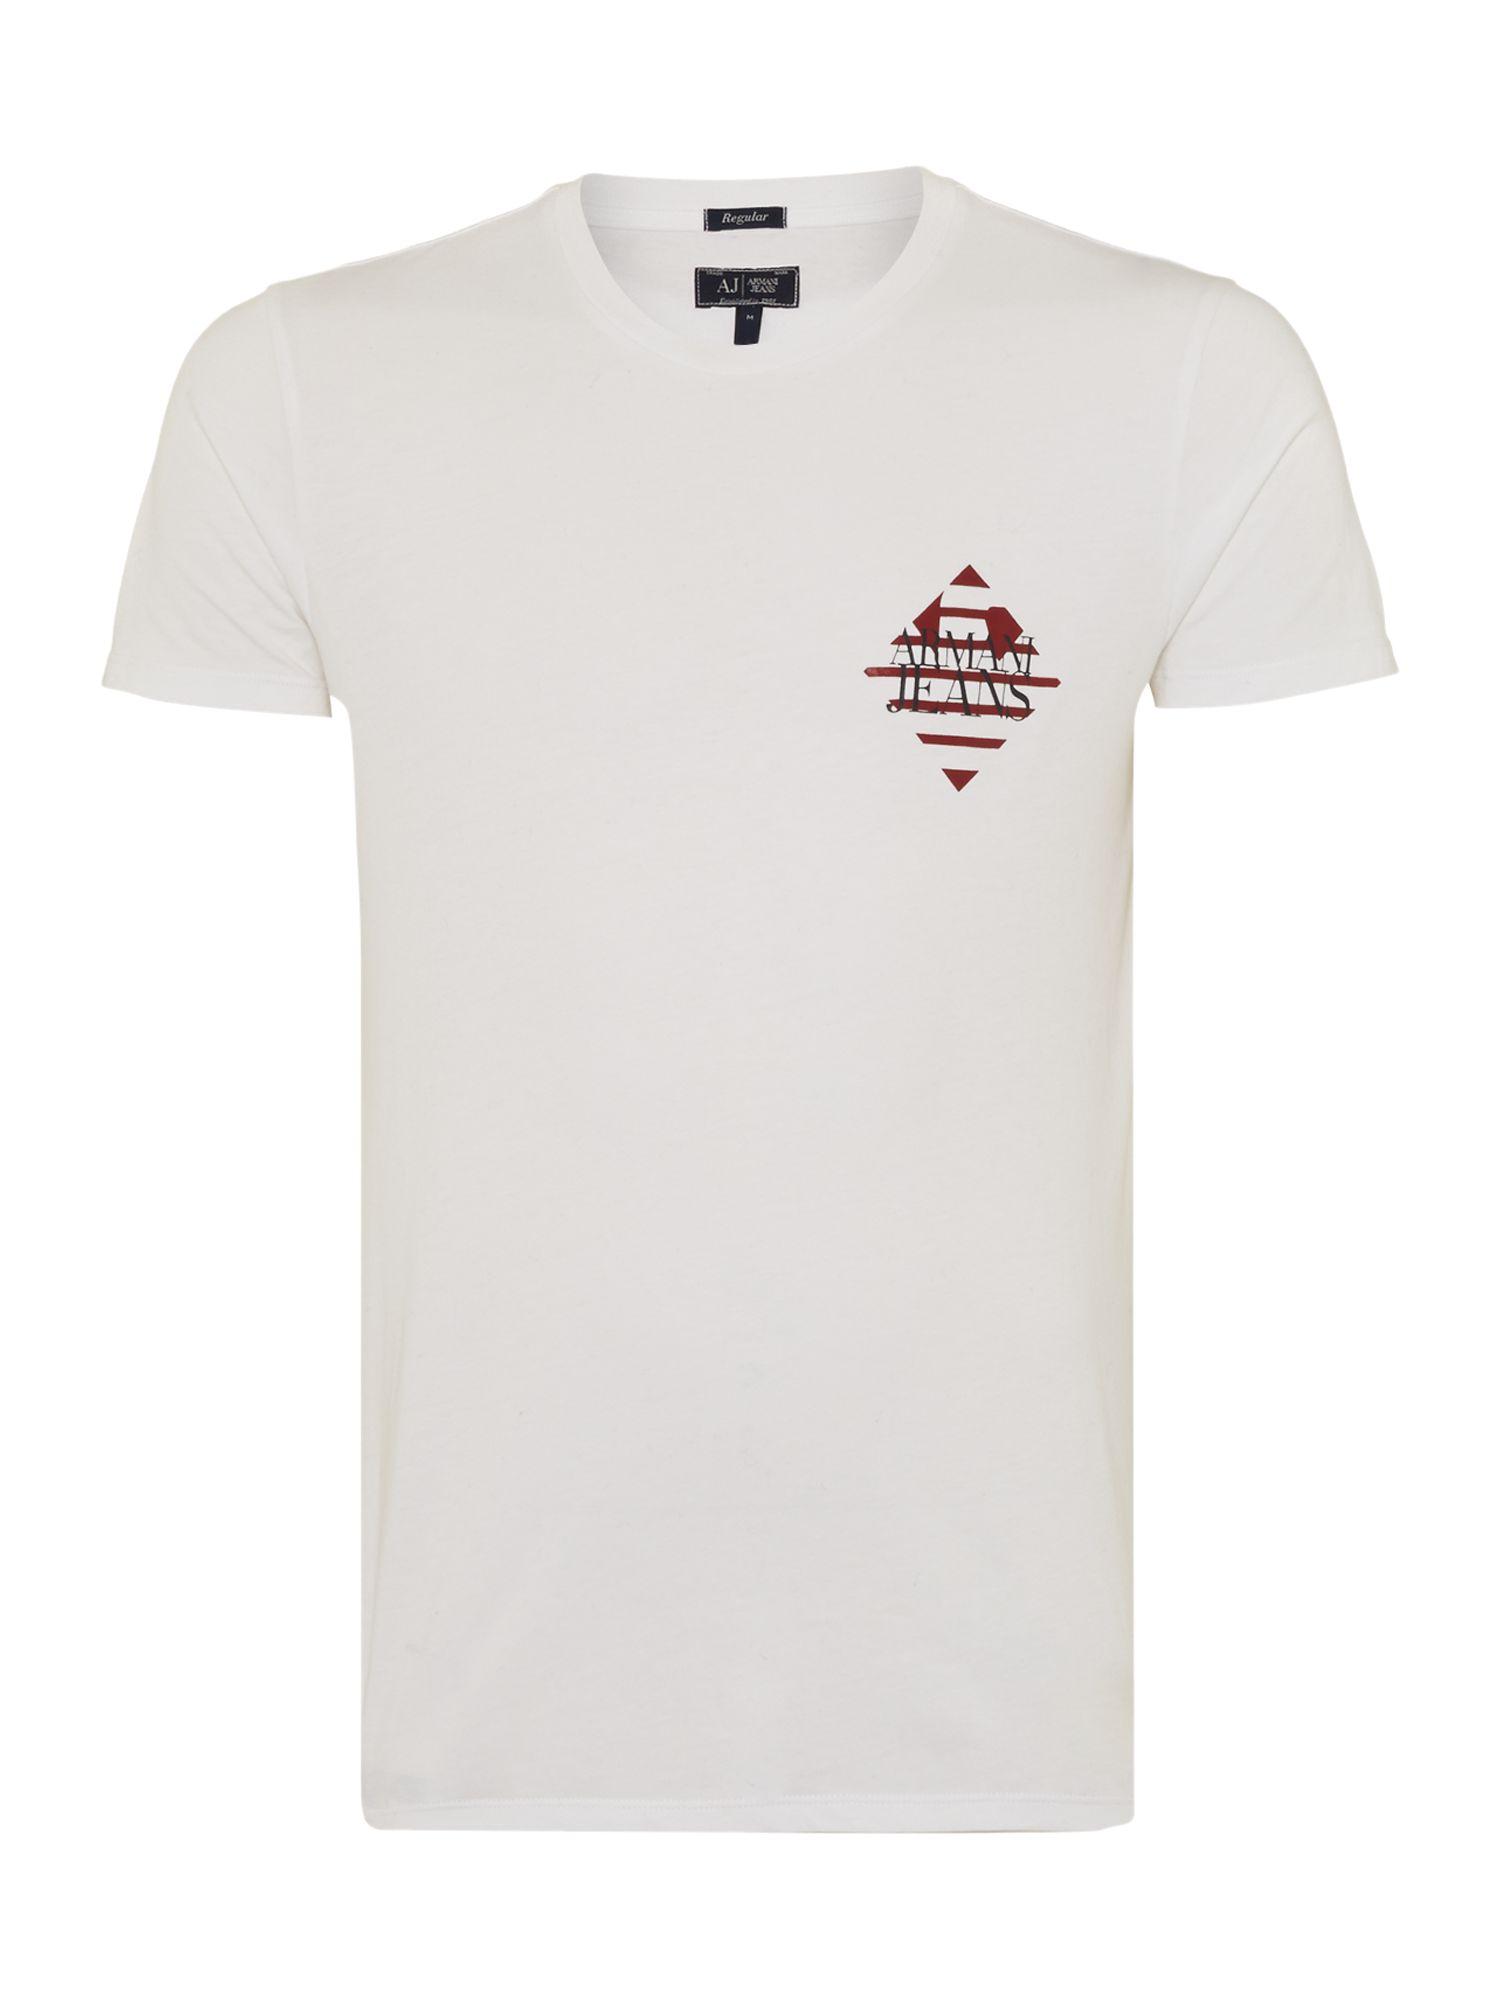 Lyst armani jeans armani pocket logo print t shirt in for Print logo on shirt